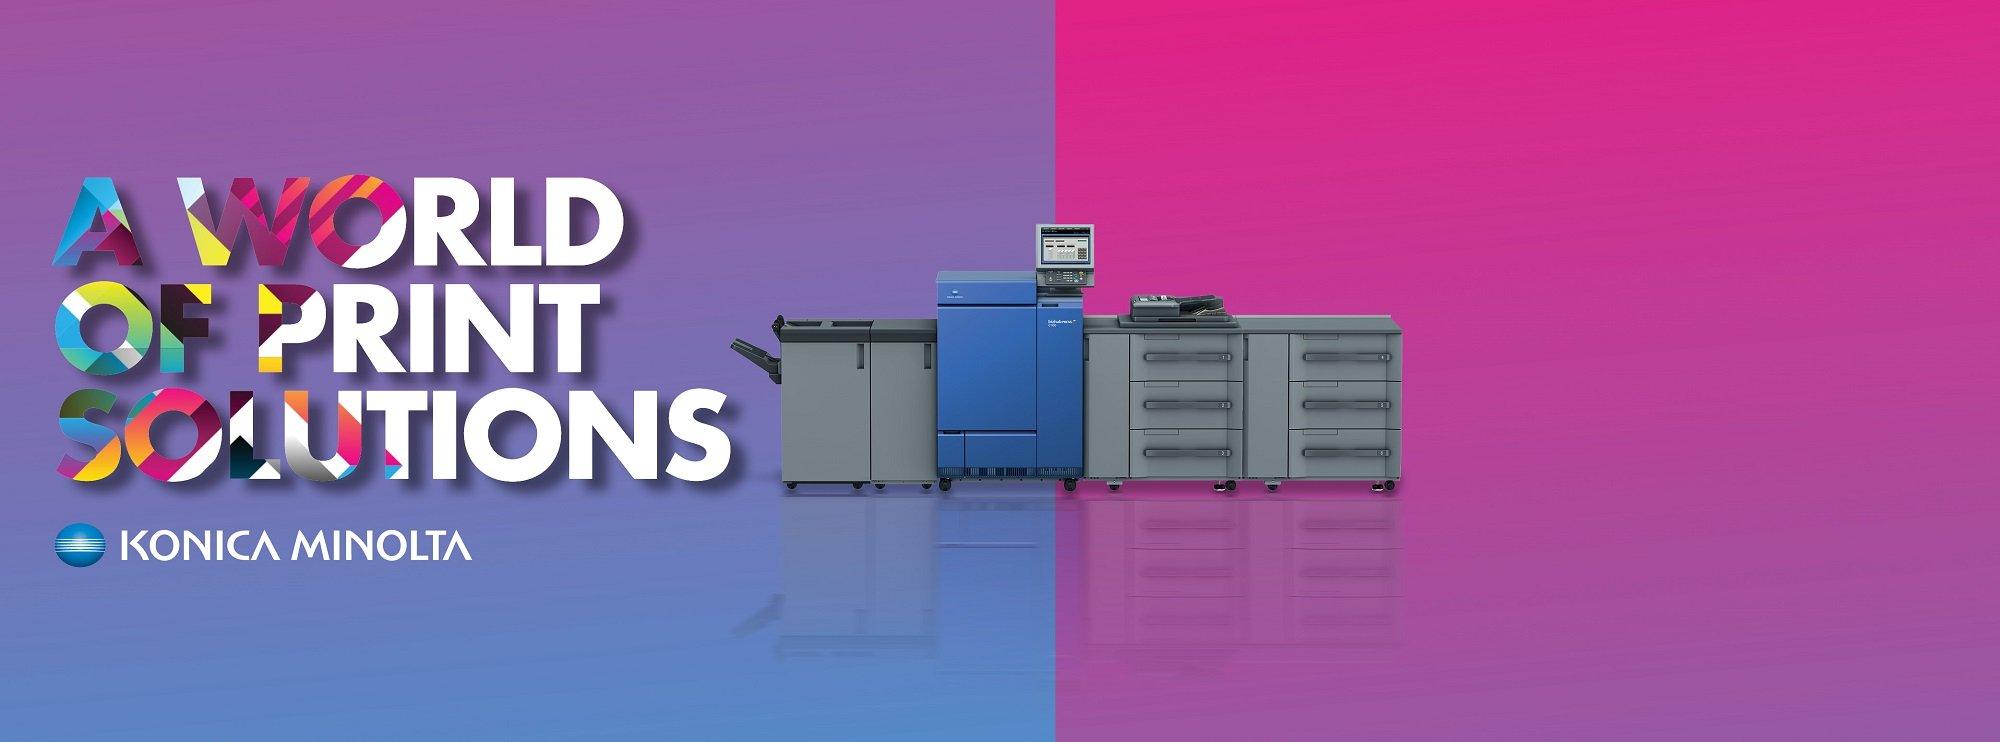 14 222 printers bunners 2000x7423 1 1, מדפסות לייזר צבע, מדפסות לייזר צבעוניות, מדפסות לייזר לעסק, מדפסות לייזר למשרד